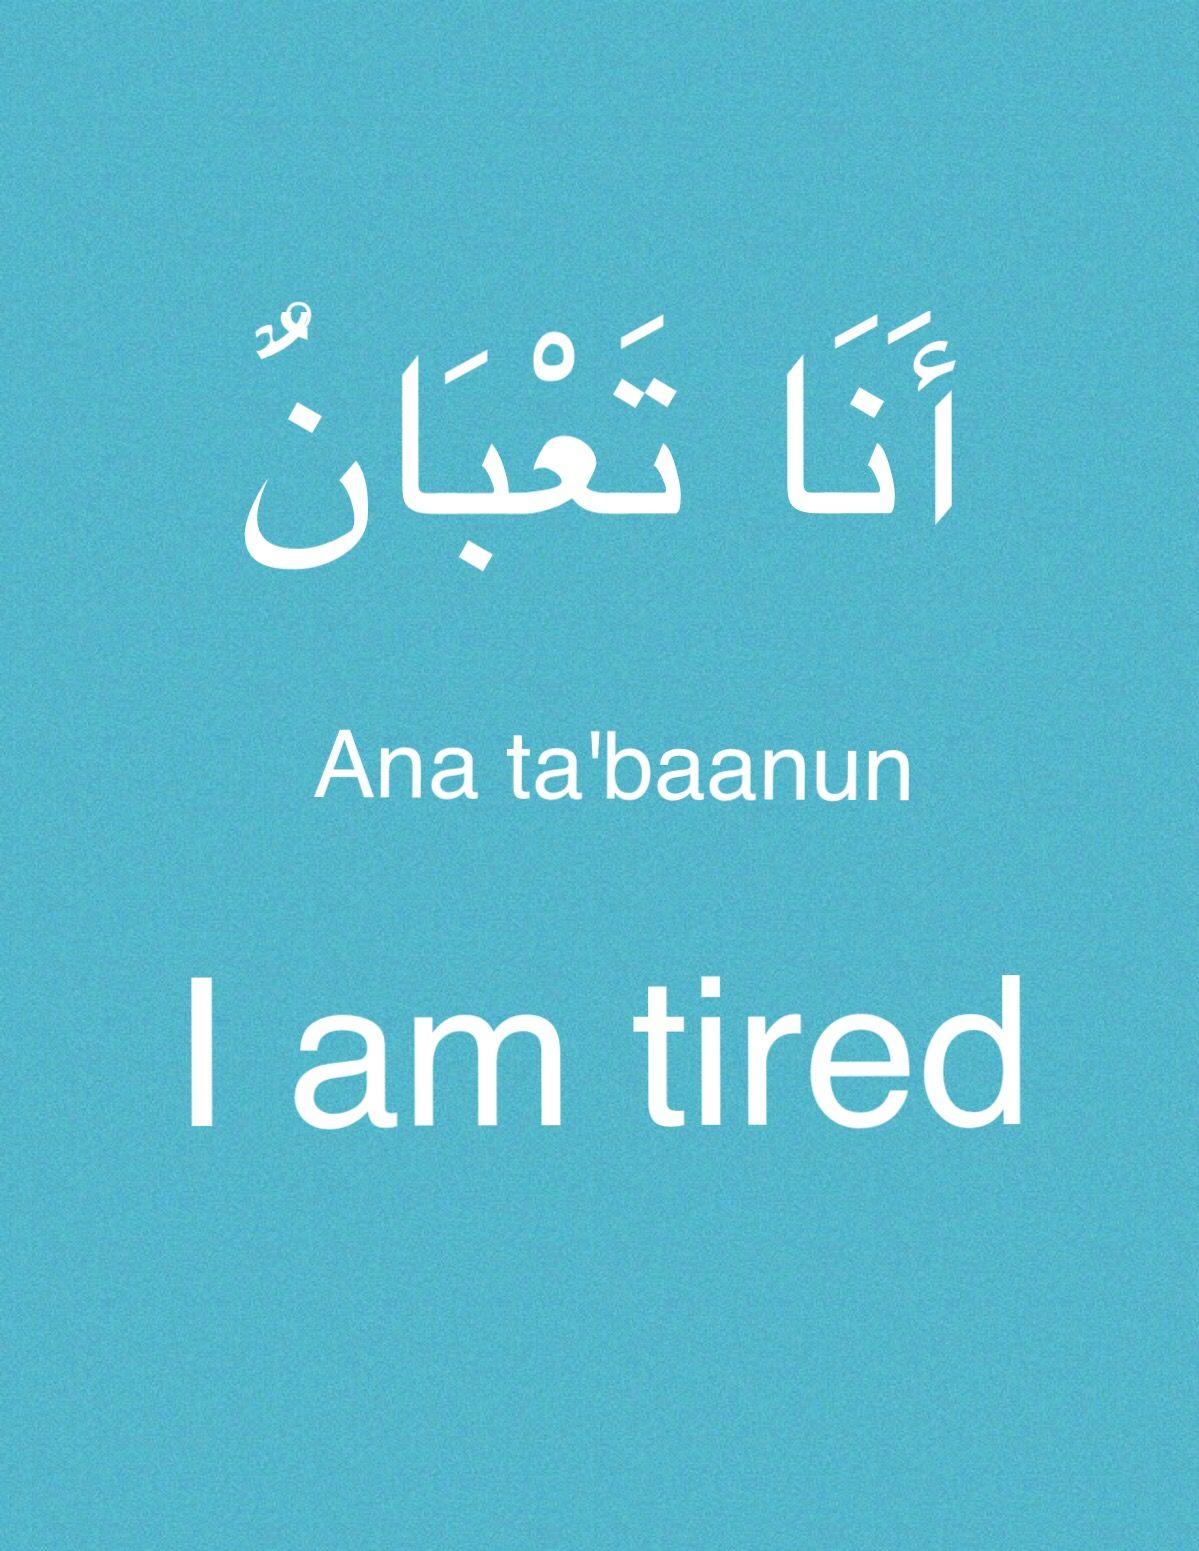 Easy Arabic Learn Arabic Language Learning Arabic Arabic Language